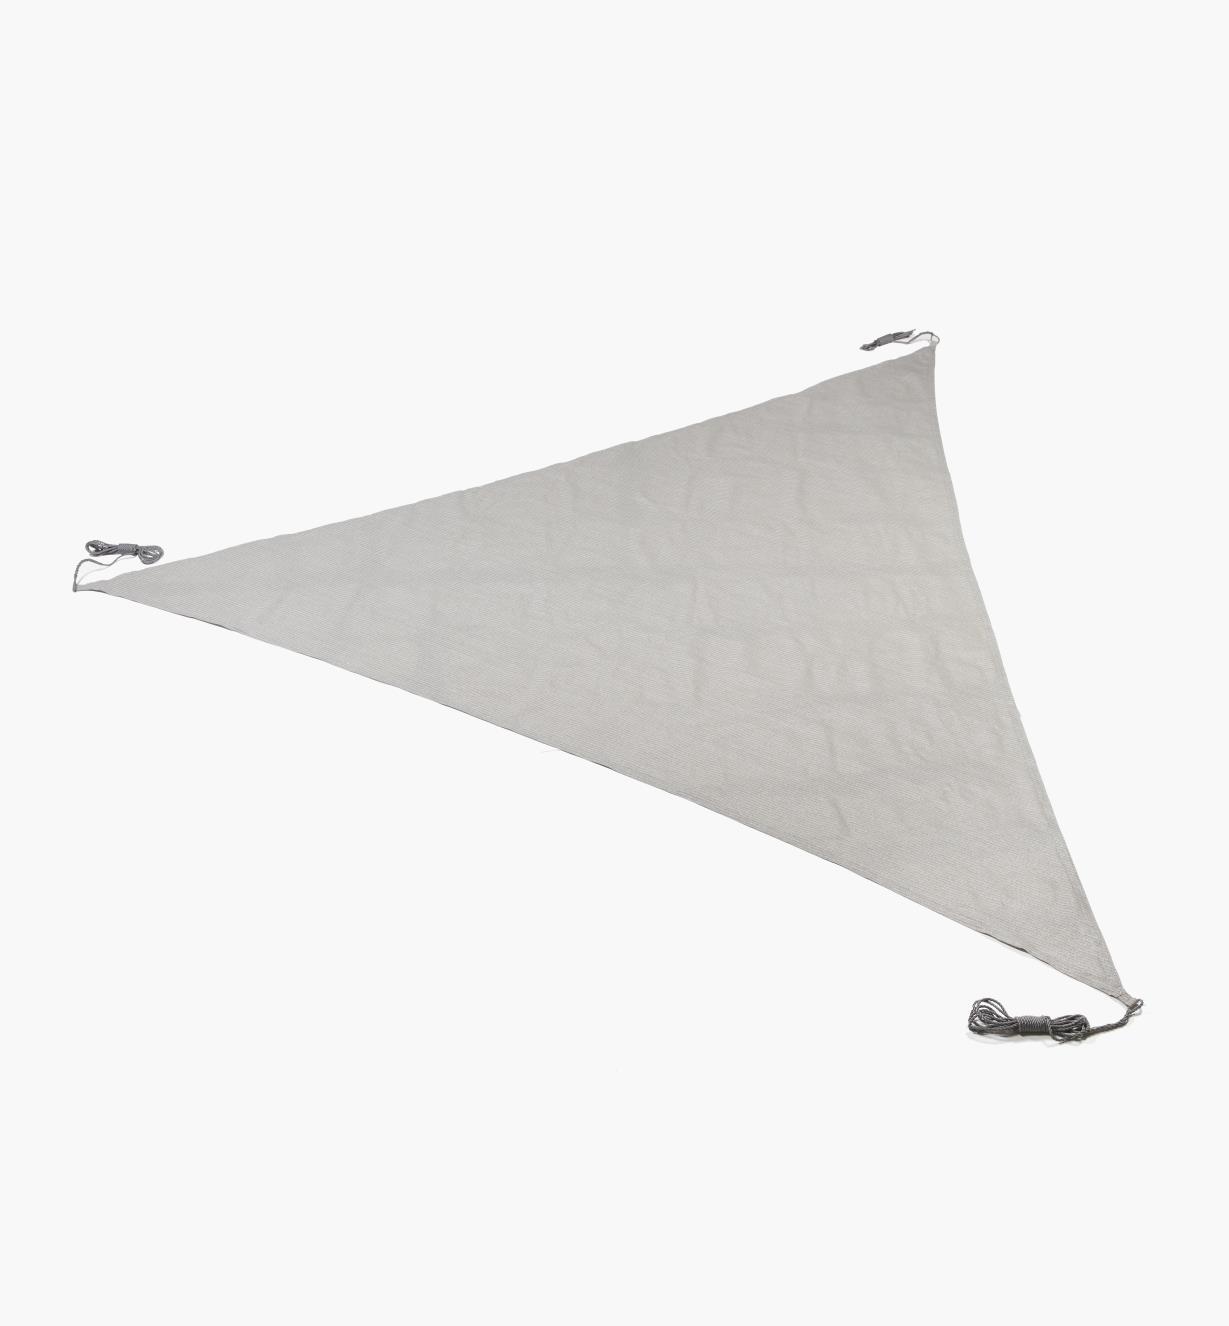 "BL614S - Coolaroo 11'10"" Triangle Shade Sail"